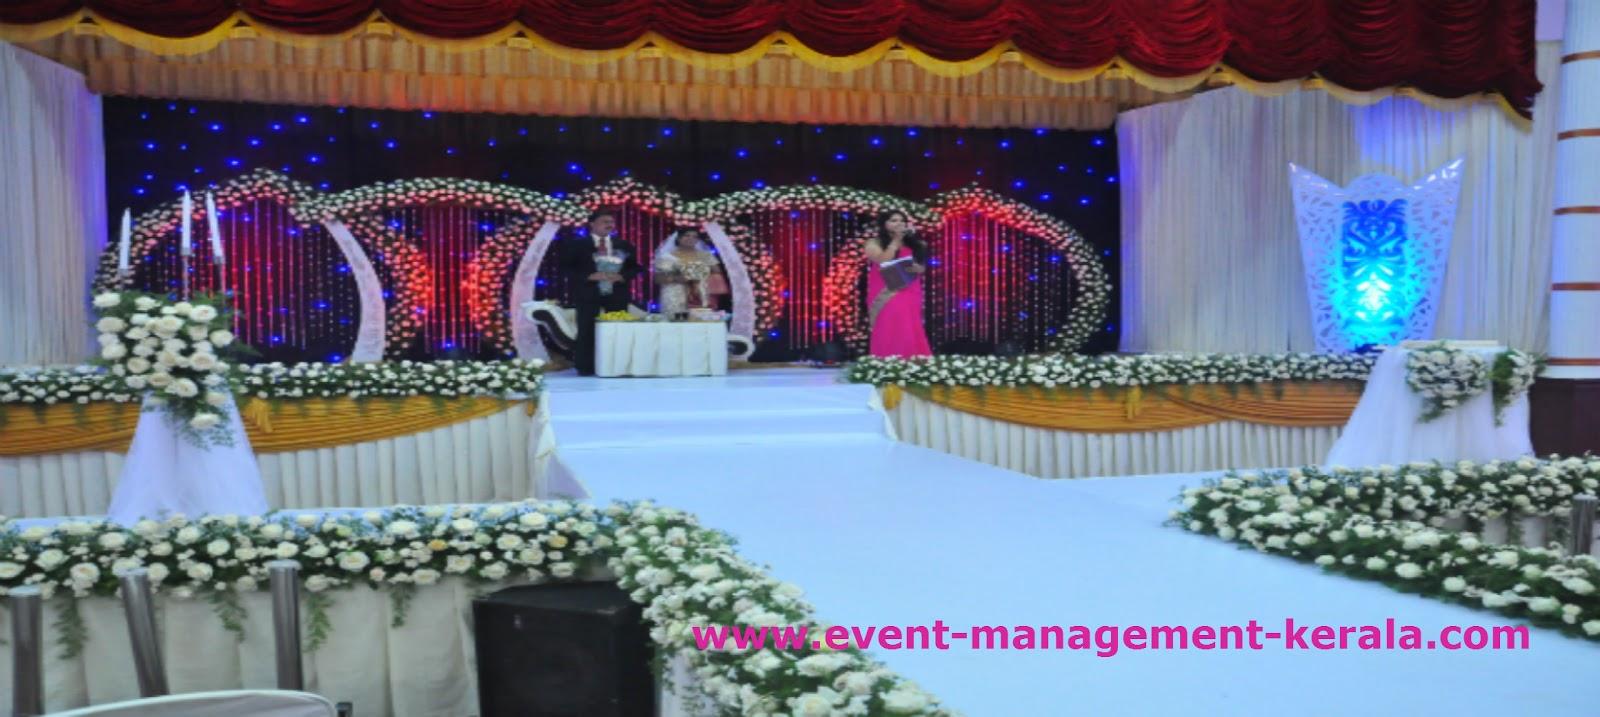 Melodia Event Management Kerala Event Management and Wedding